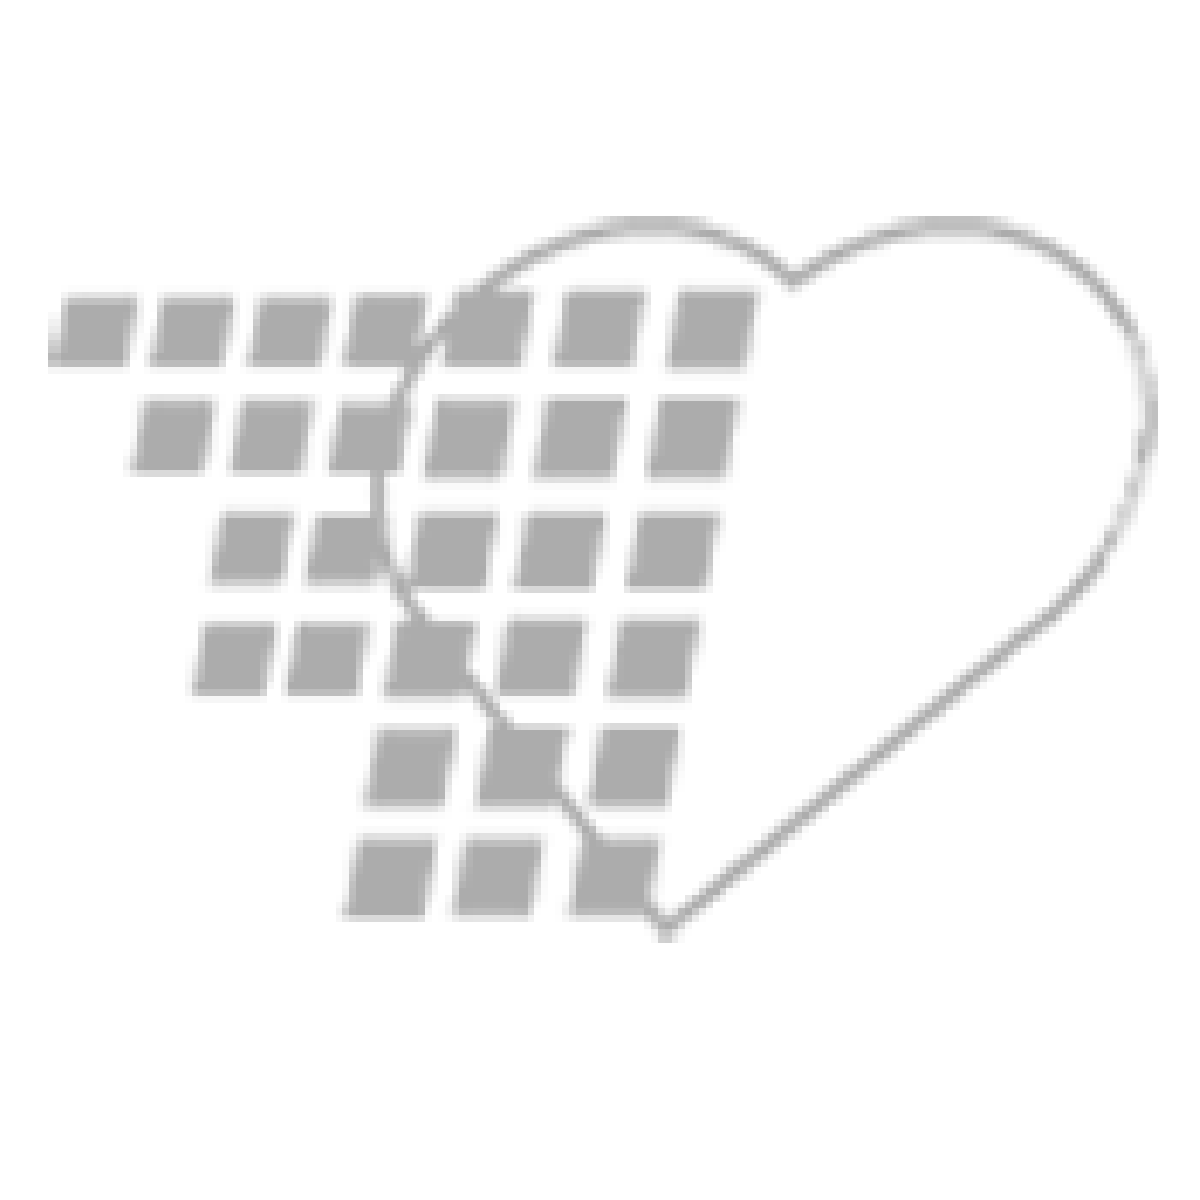 06-93-9019 - Demo Dose® Phenergn (Promethazin) Ampule 25mg/mL